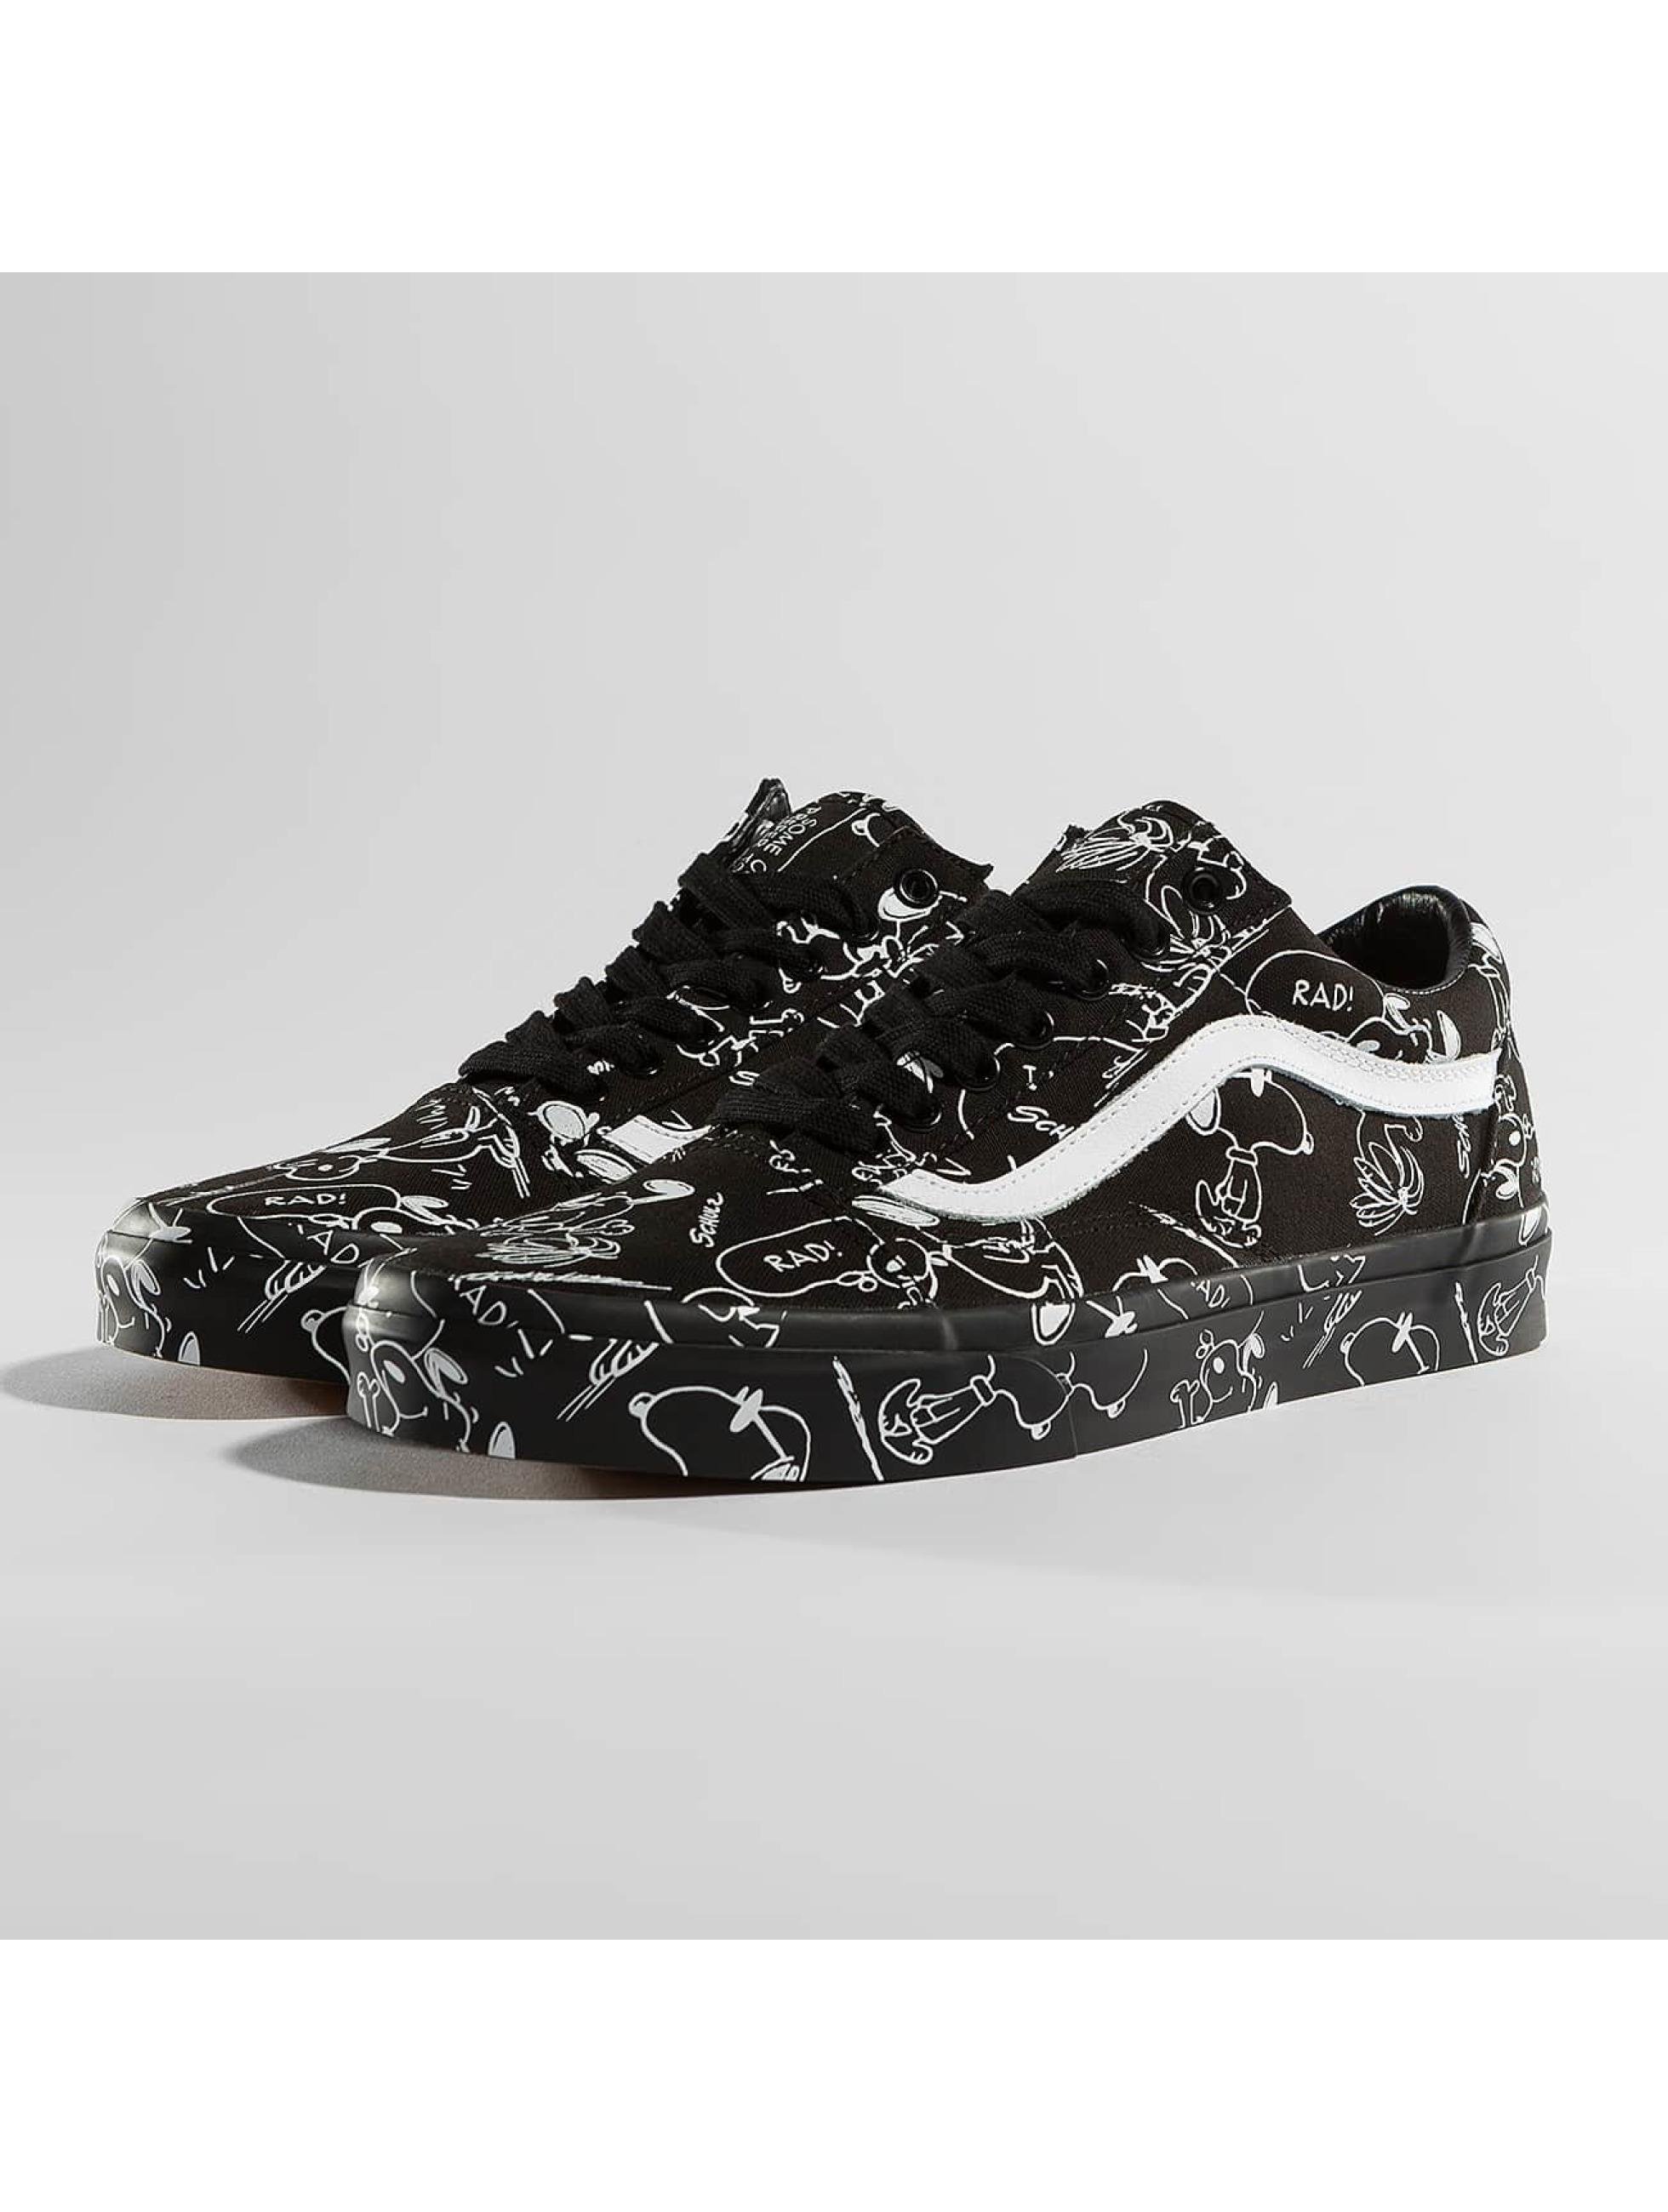 Vans Sneaker Peanuts Old School nero